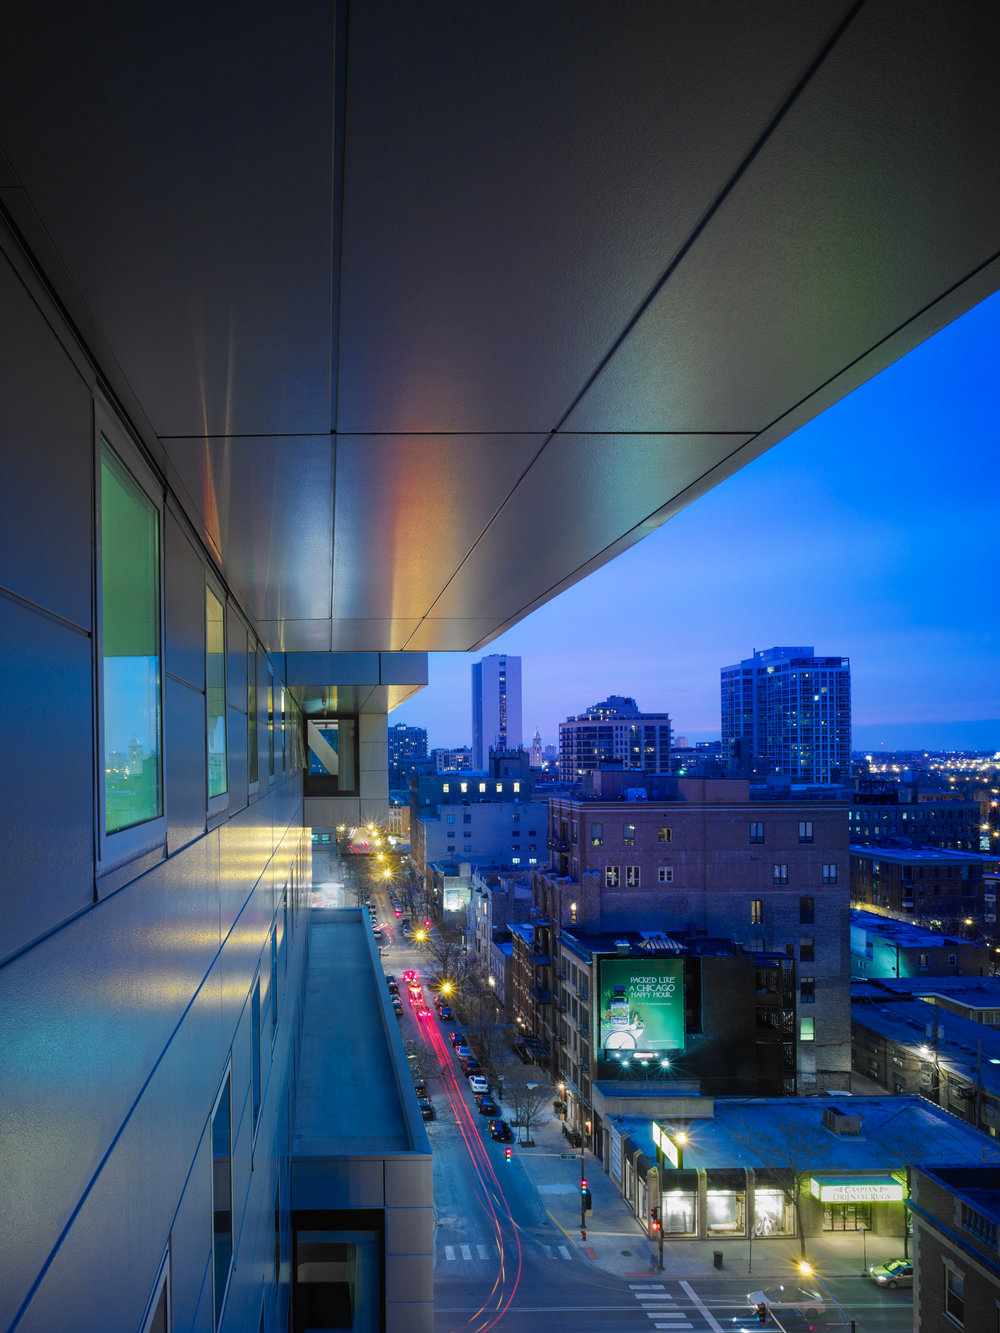 godfrey-hotel_valerio-dewalt-train_architects